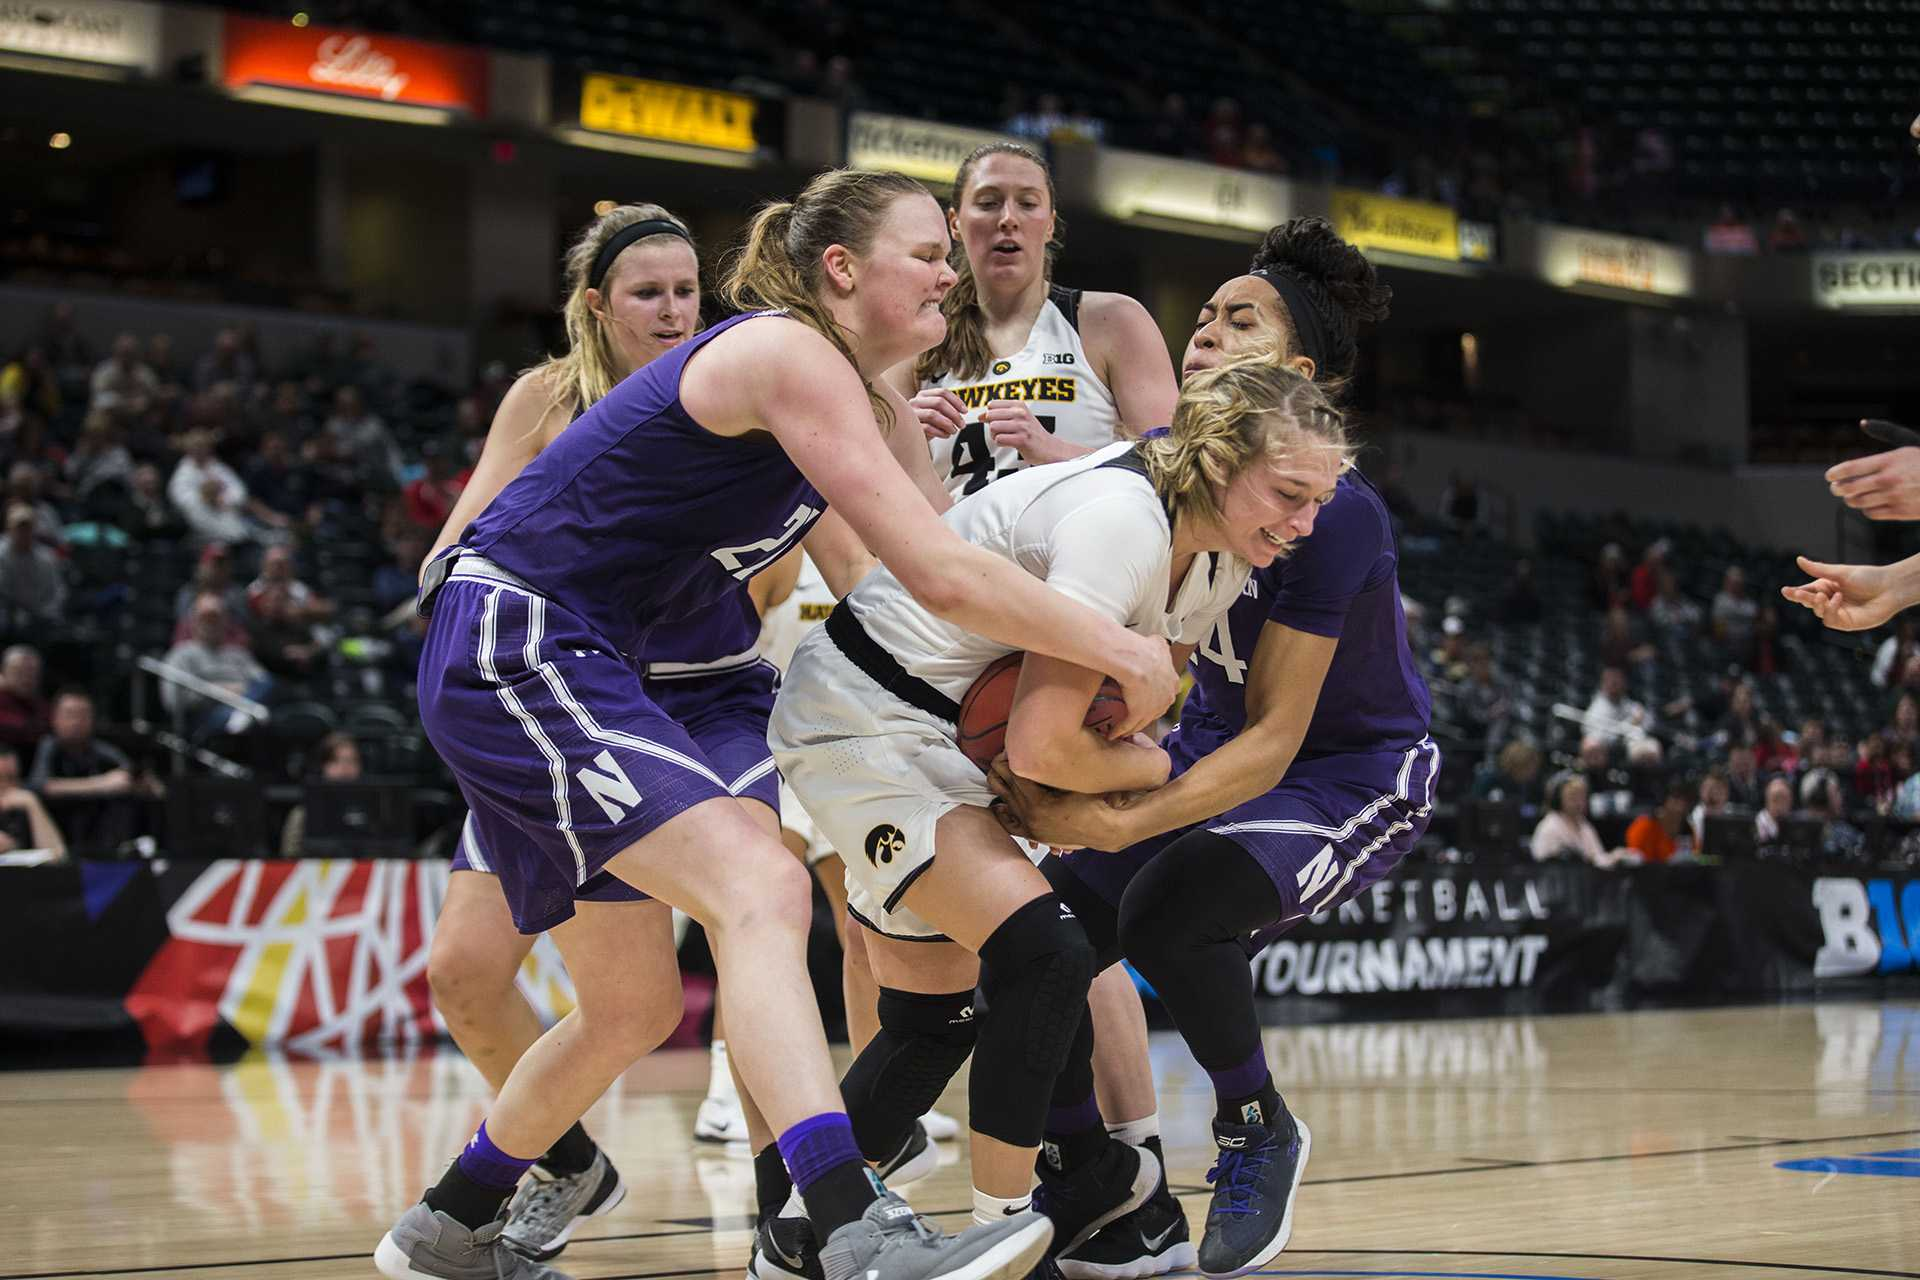 Photos: Big Ten tournament women's basketball vs. Northwestern